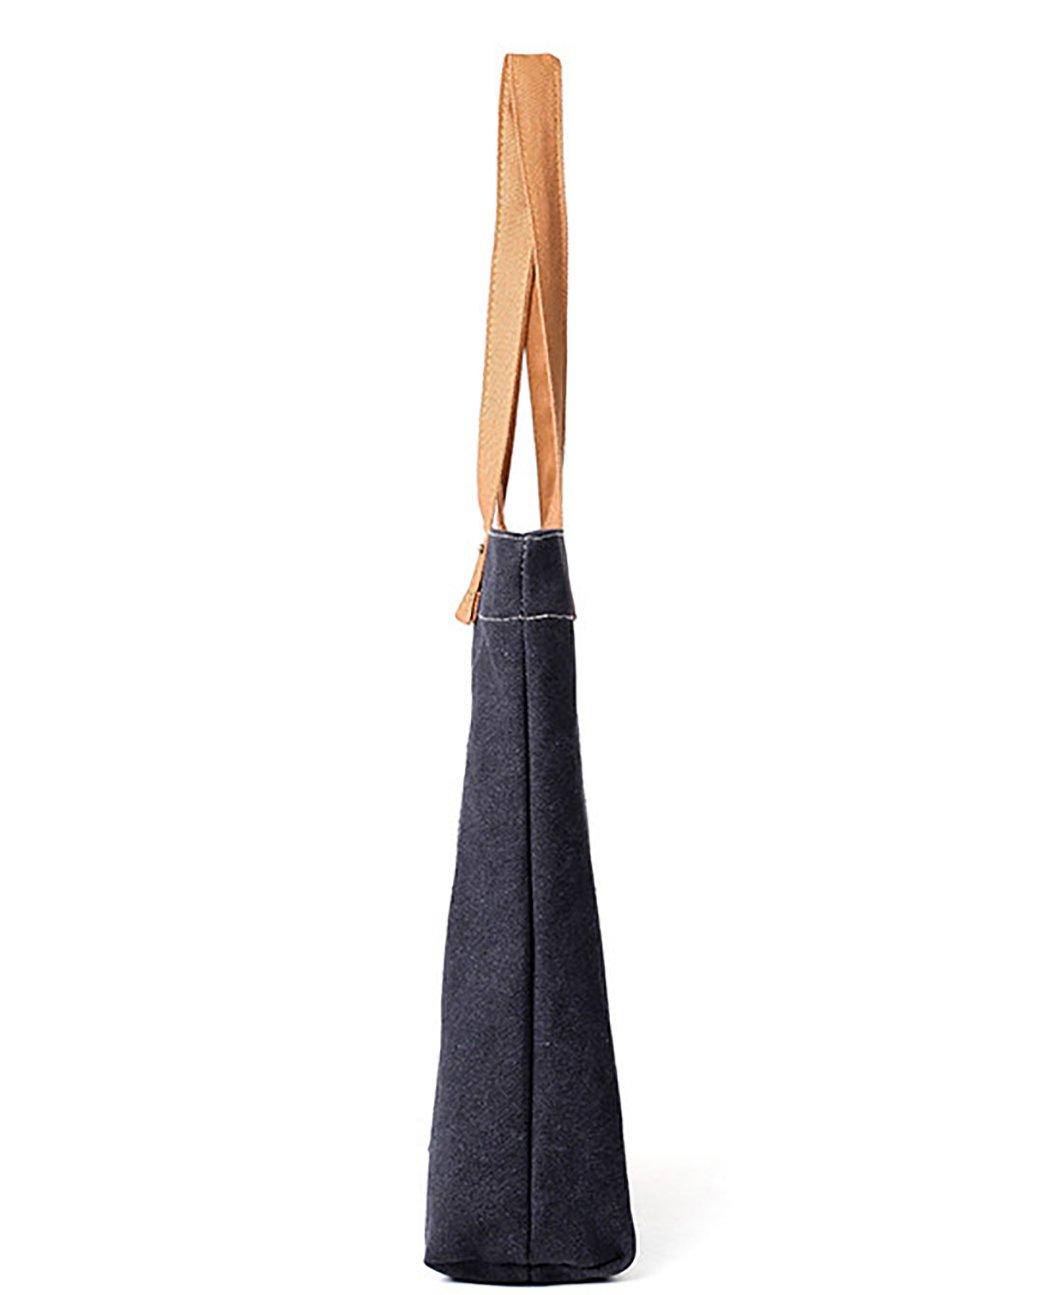 Bageek Canvas Tote Bag Handbags for Womens Bag Canvas Purses and Handbags by Bageek (Image #3)